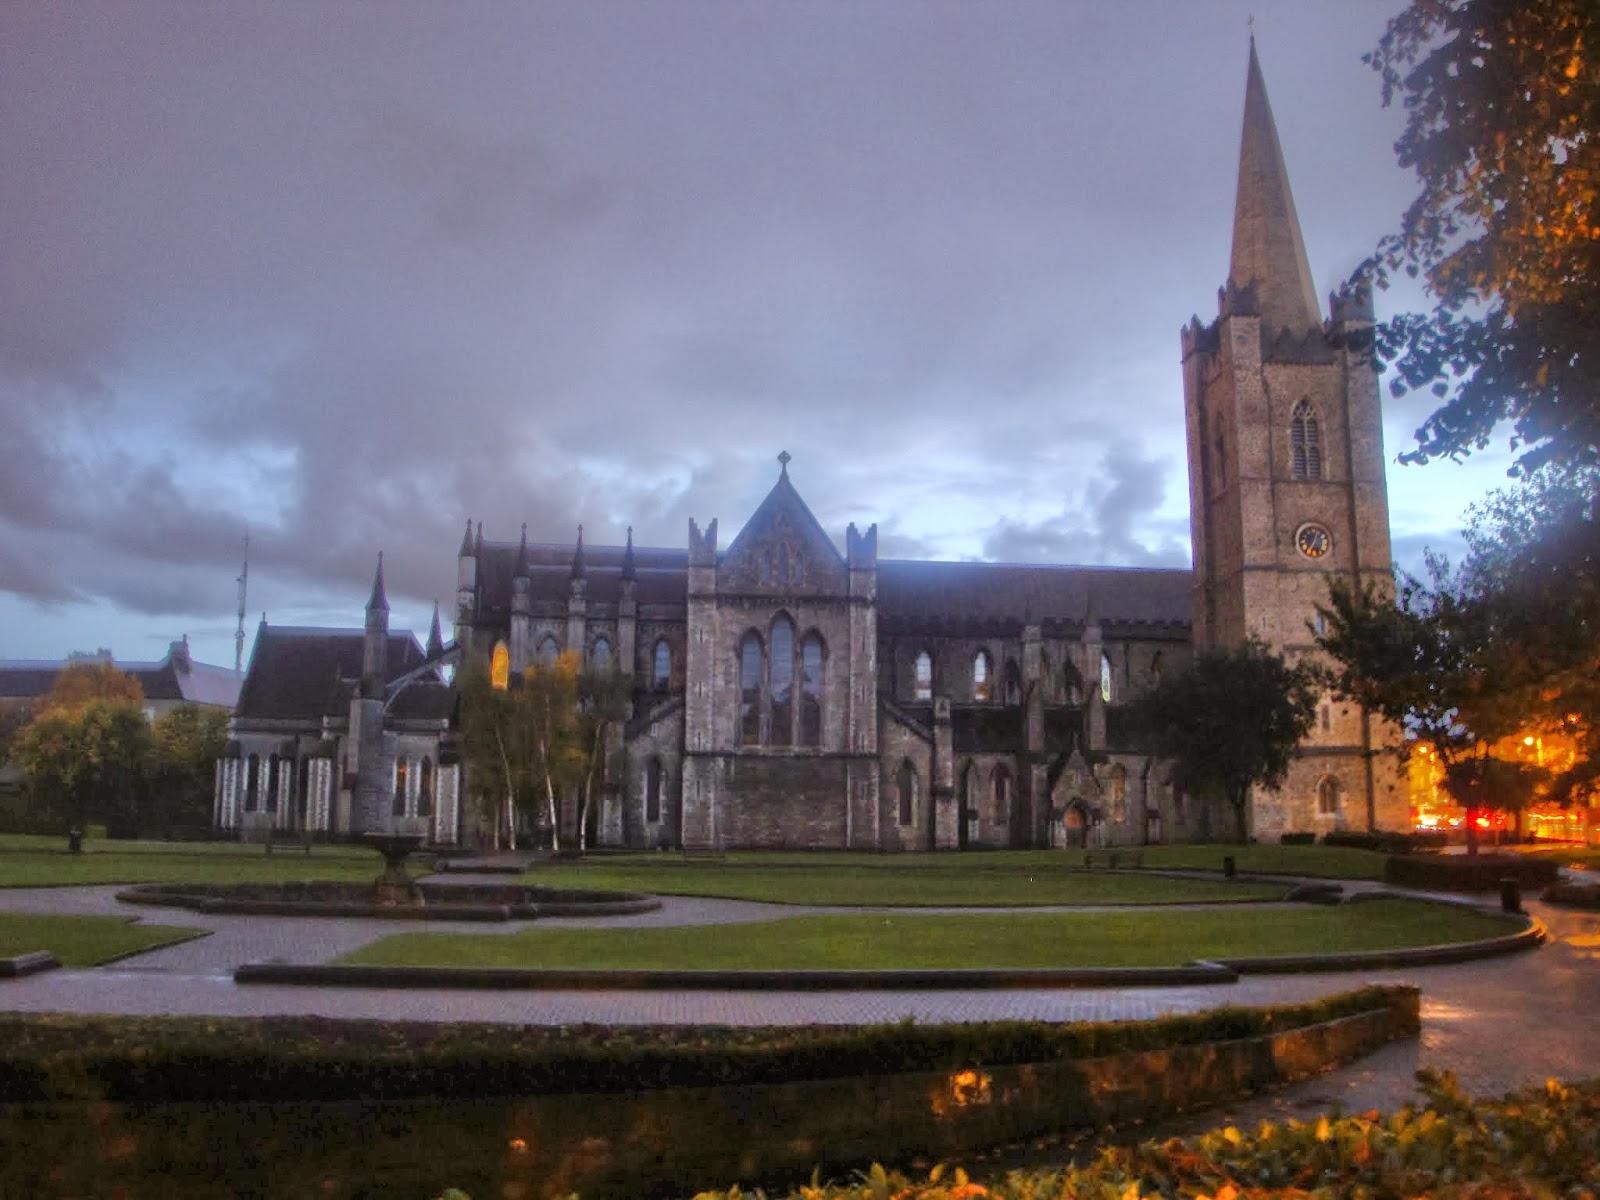 St. Patrick's Church. Guía de viaje de Dublín. Tu Maleta.